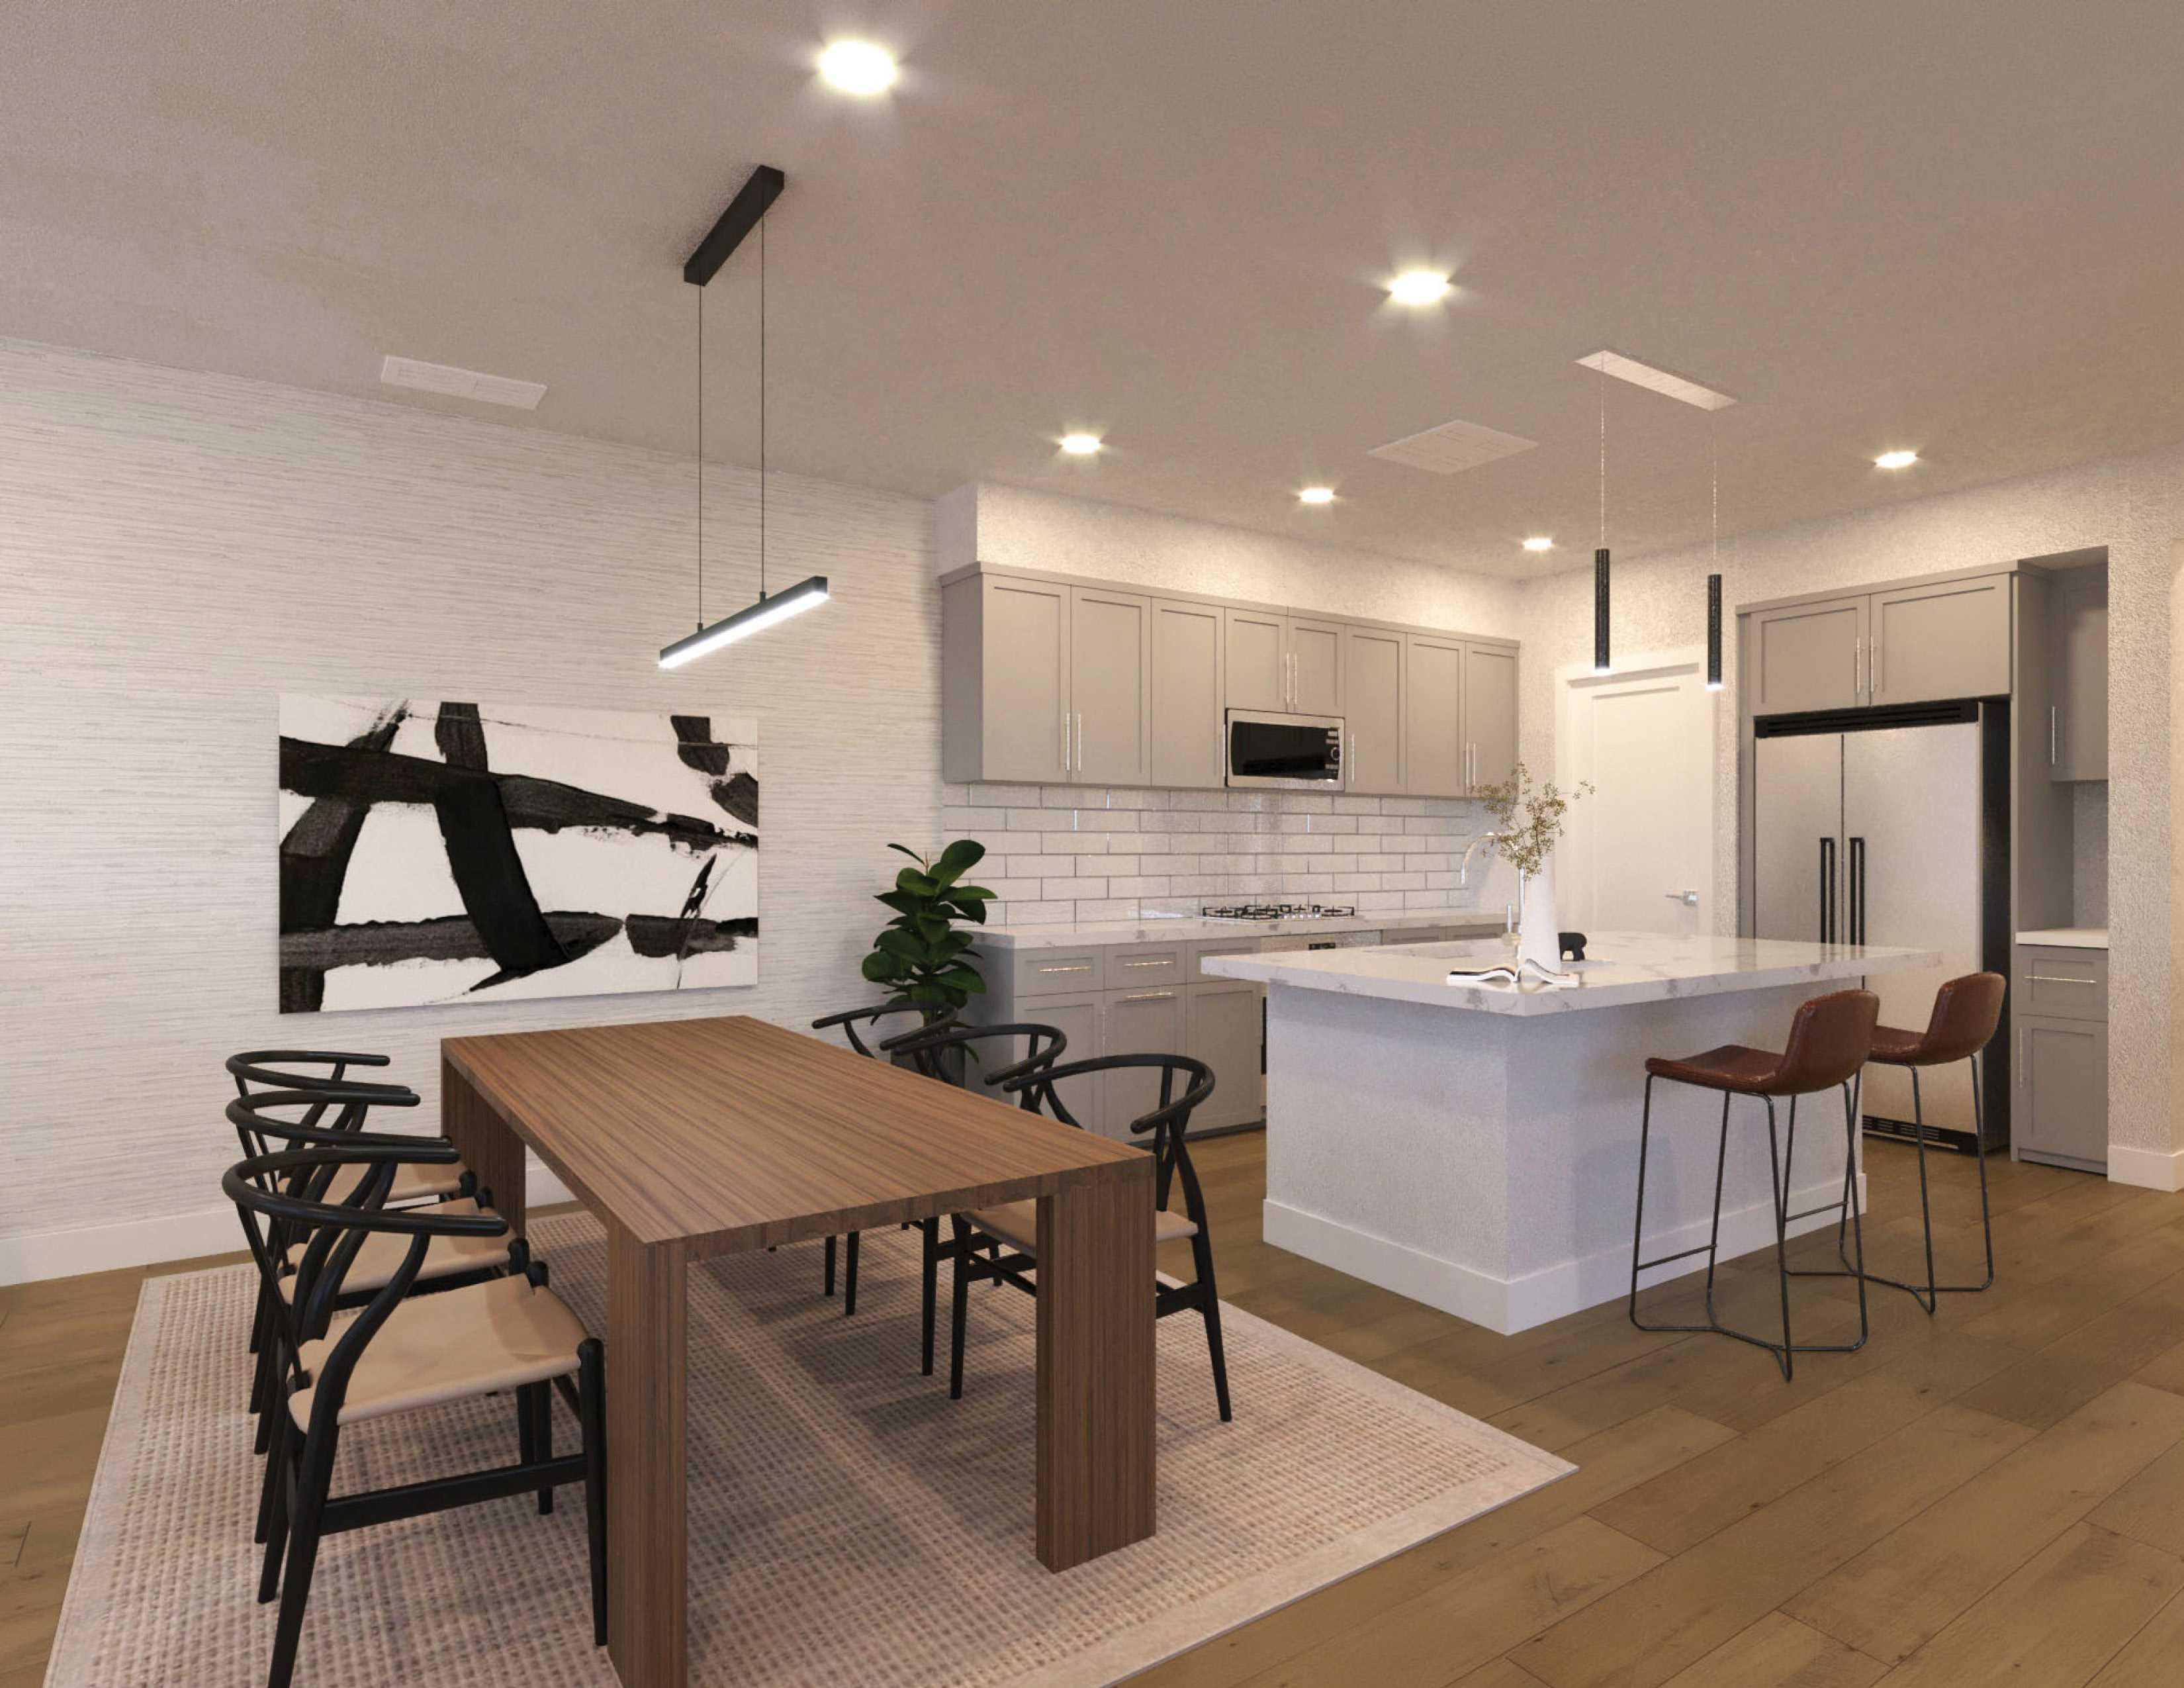 Md Studio Design San Jose Private Residence San Jose, California, Amerika Serikat San Jose, California, Amerika Serikat Md-Studio-Design-San-Jose-Private-Residence   131560